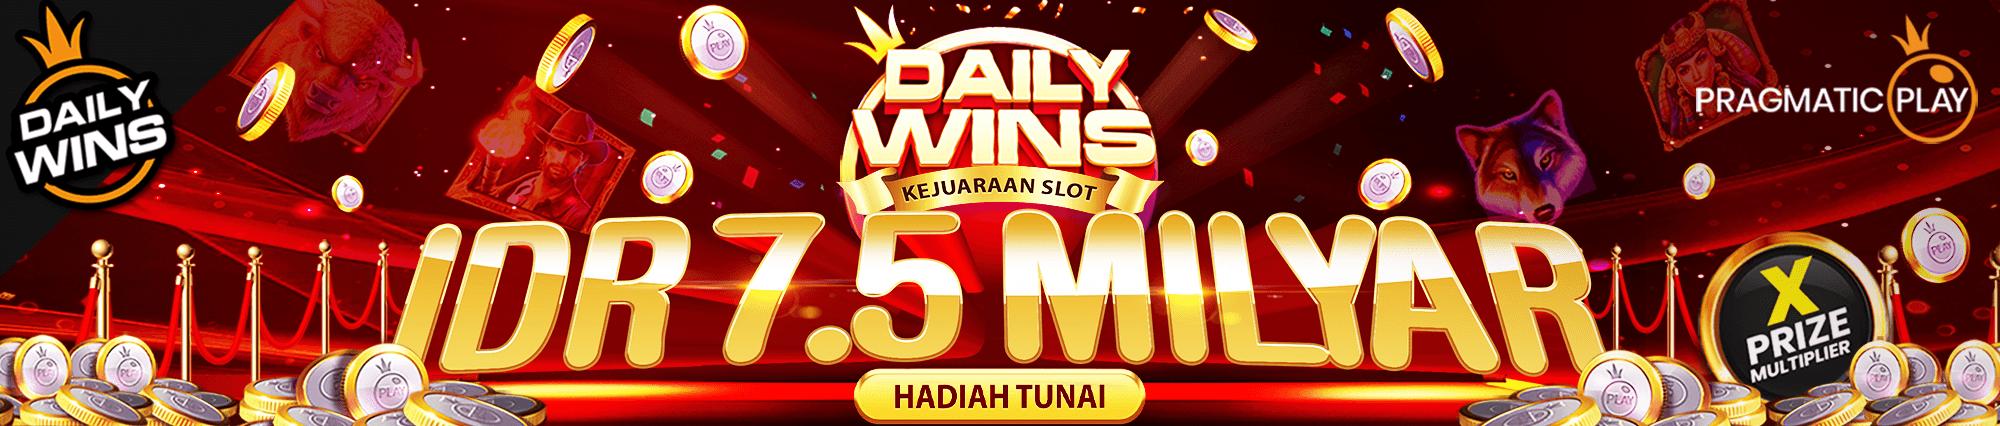 Situs Mesin Slot Online Indonesia Game Slot Online Freebet